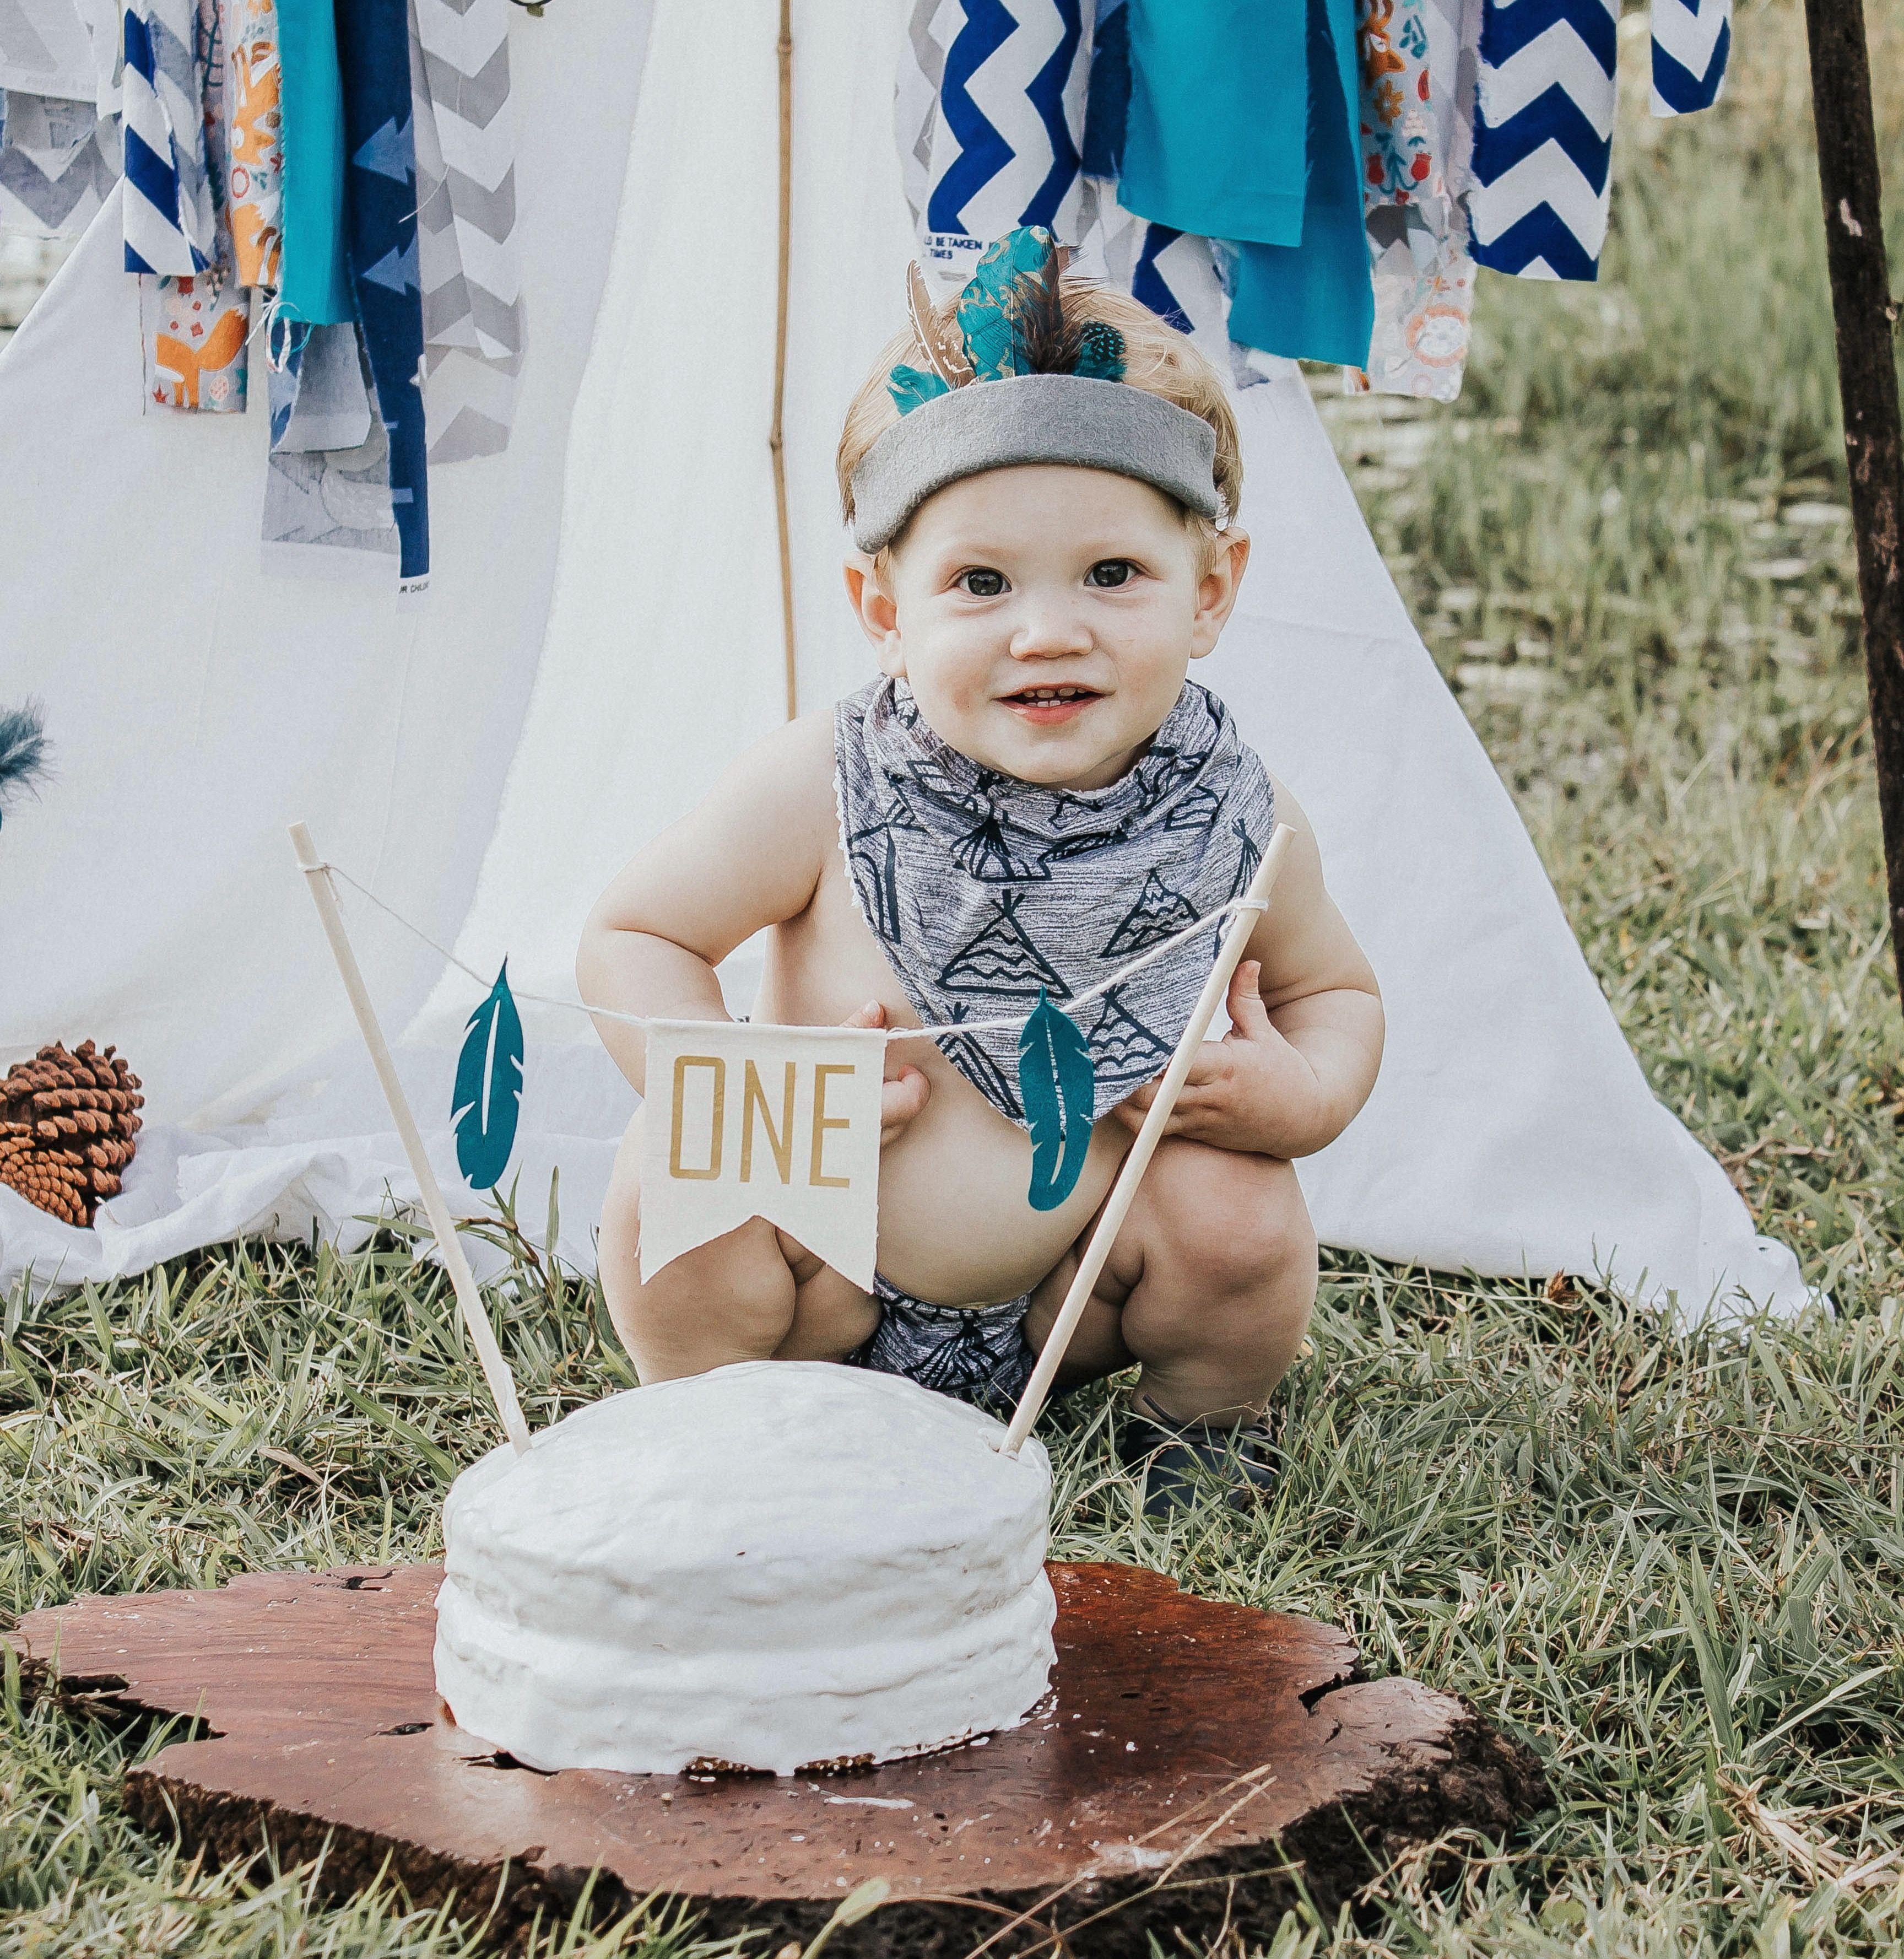 smash cake boy cake smash outfit boy woodland cake smash 1st birthday boy outfit cake smash tie diaper cover tie baby fox baby tie